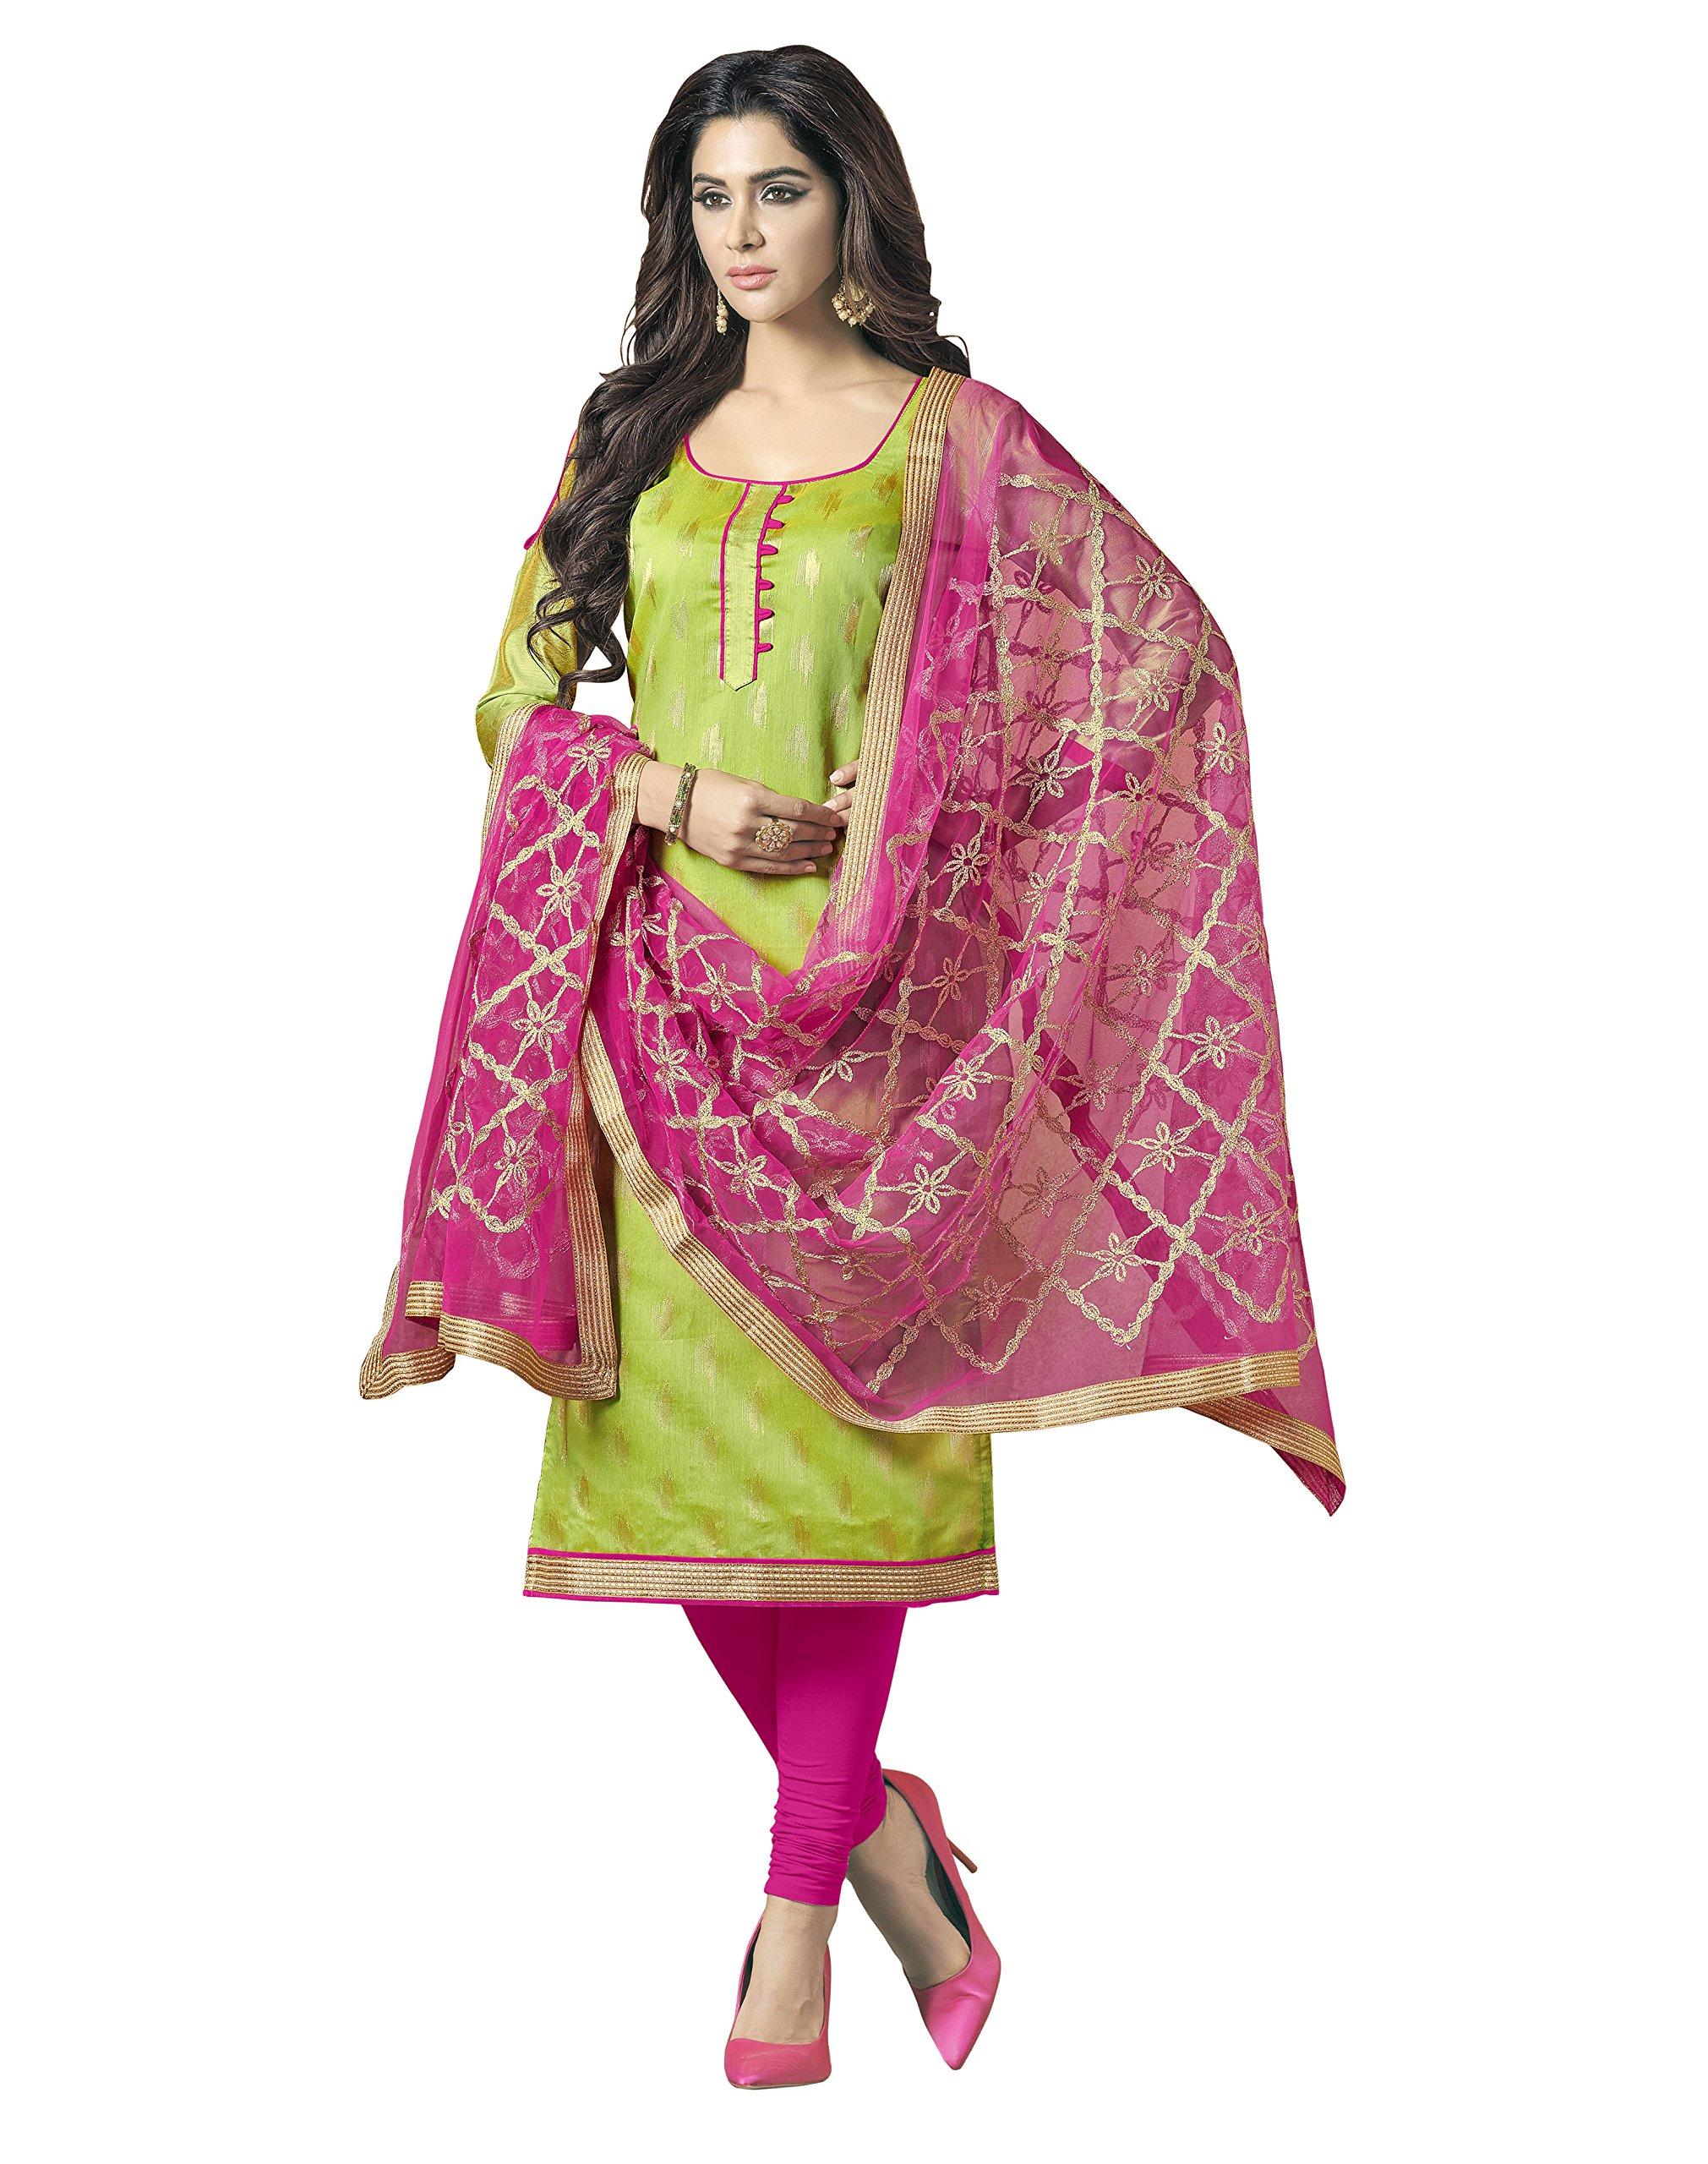 da7f1fc77f99eb Viva N Diva Un-Stitched Banarasi Cotton Jacquard Dress Material Dupatta For  Women s Punjabi Salwar